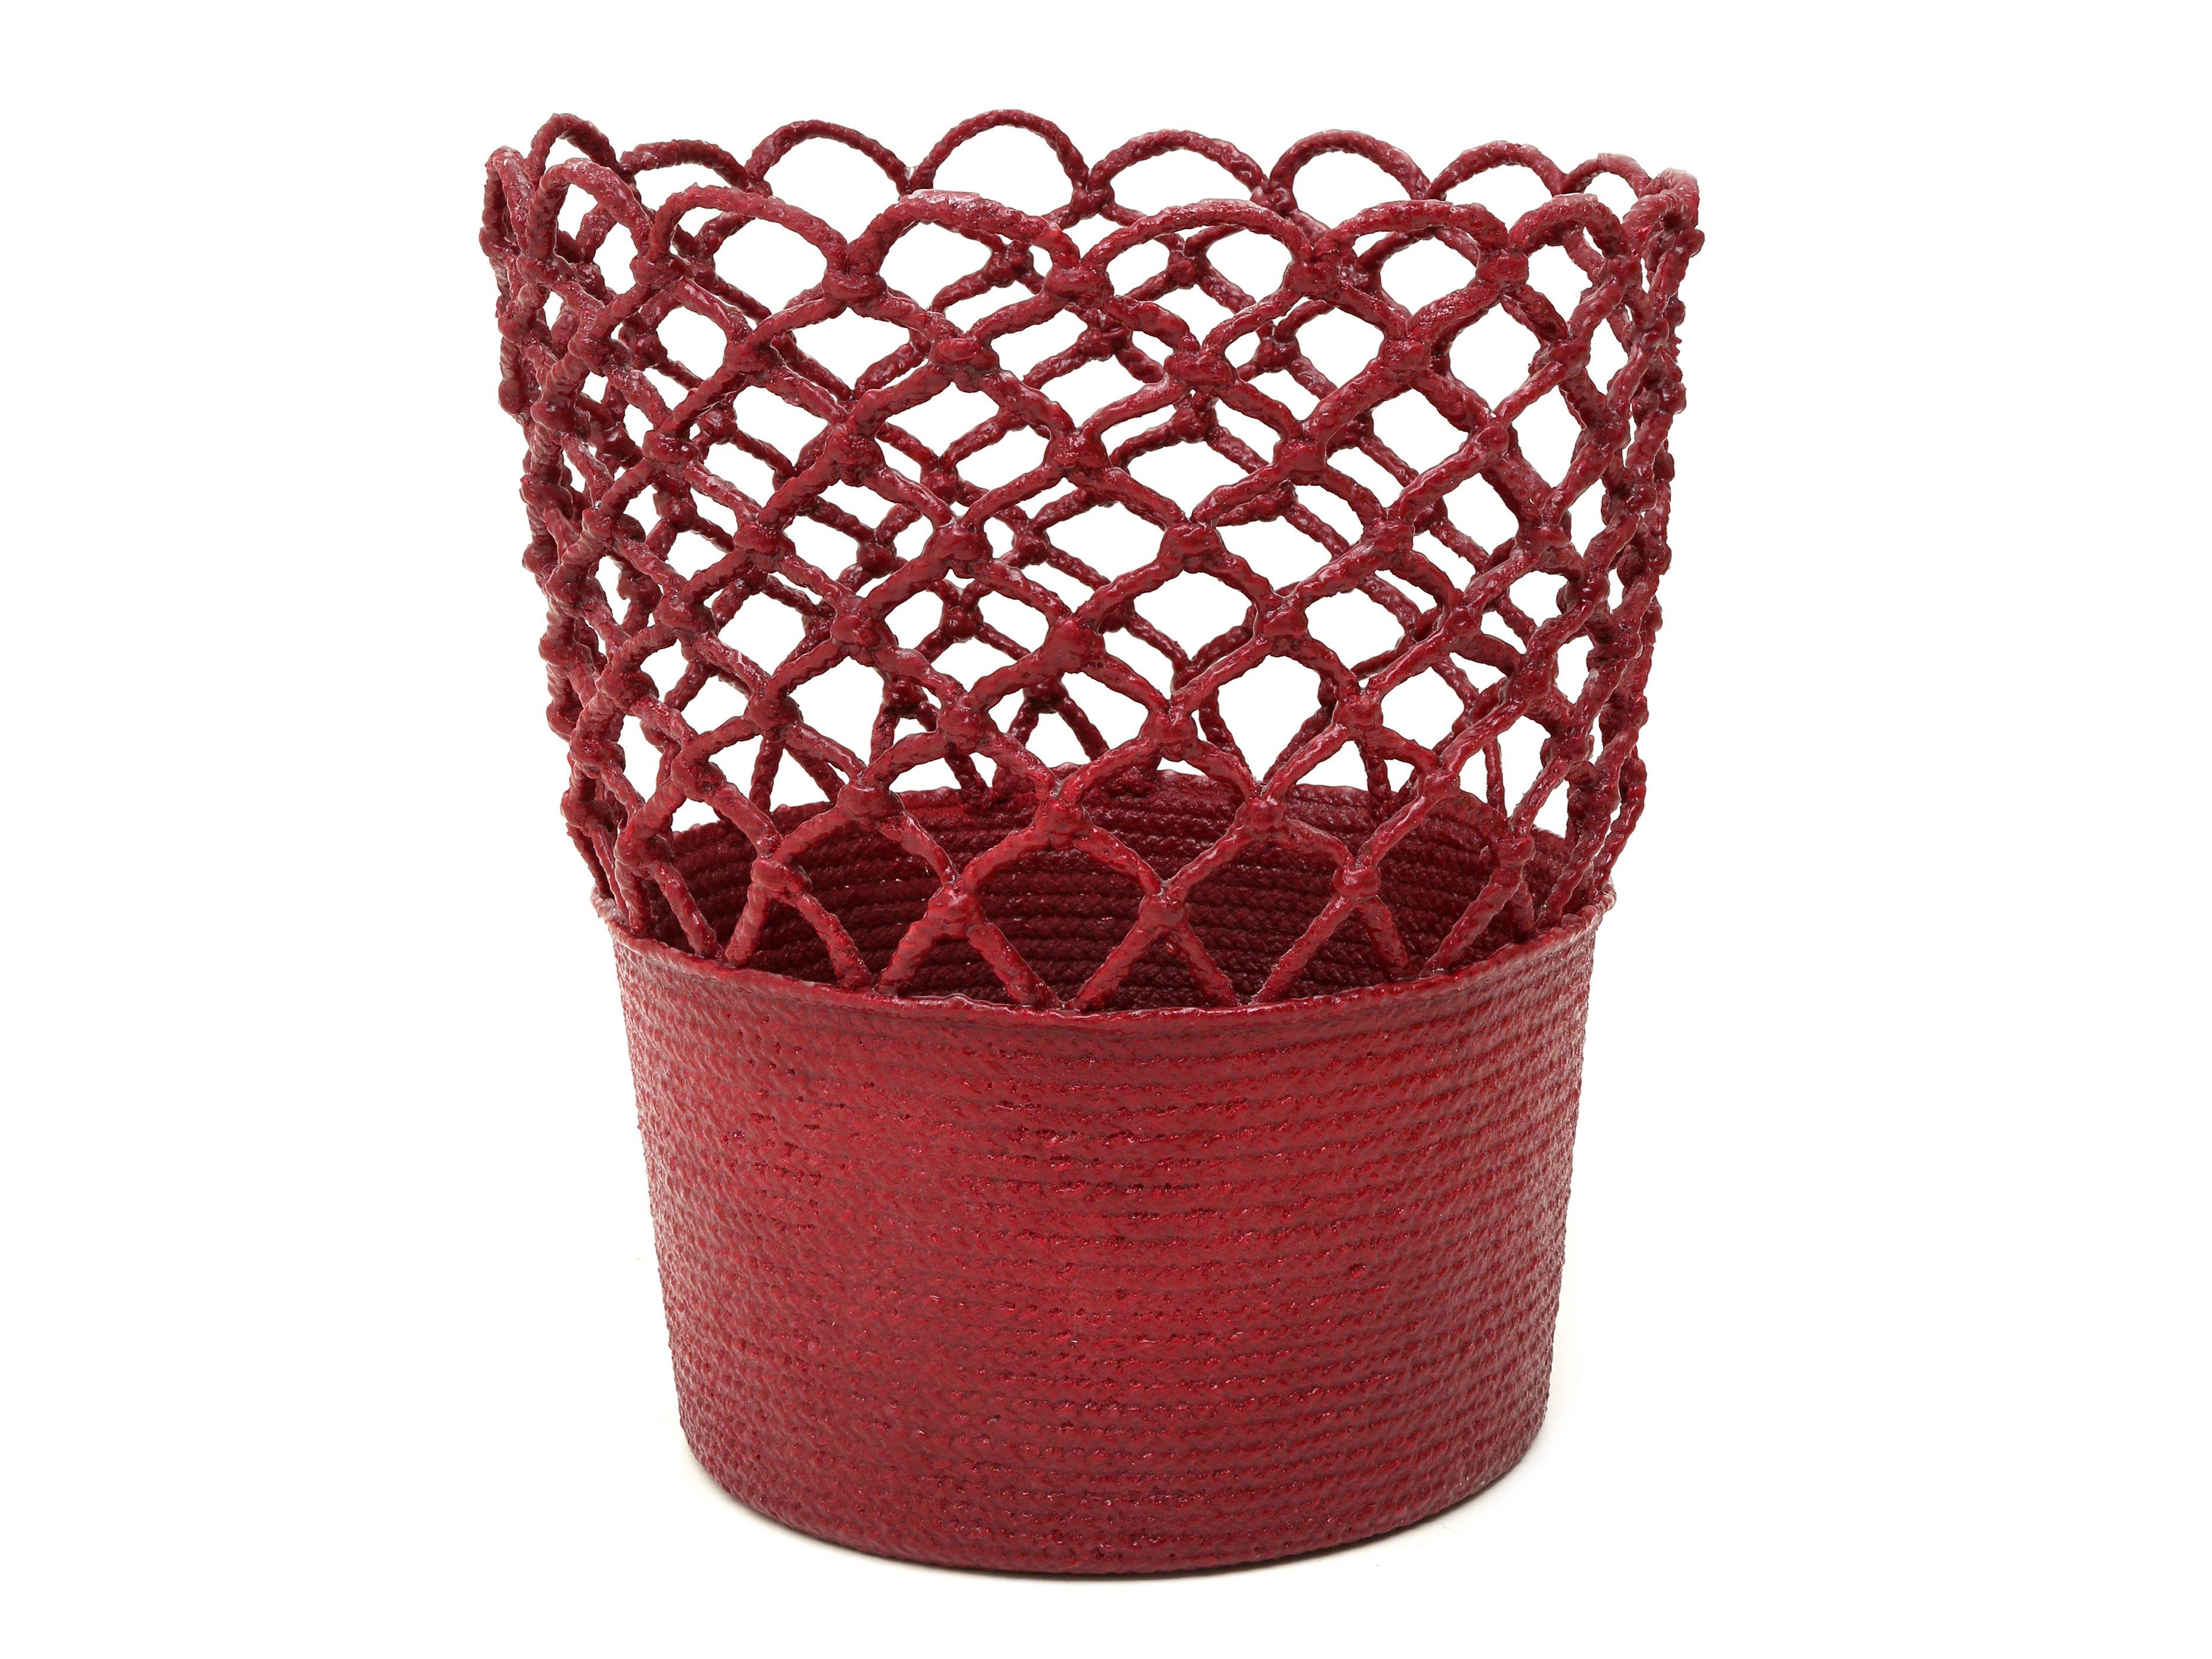 scales cache pot by darono. Black Bedroom Furniture Sets. Home Design Ideas